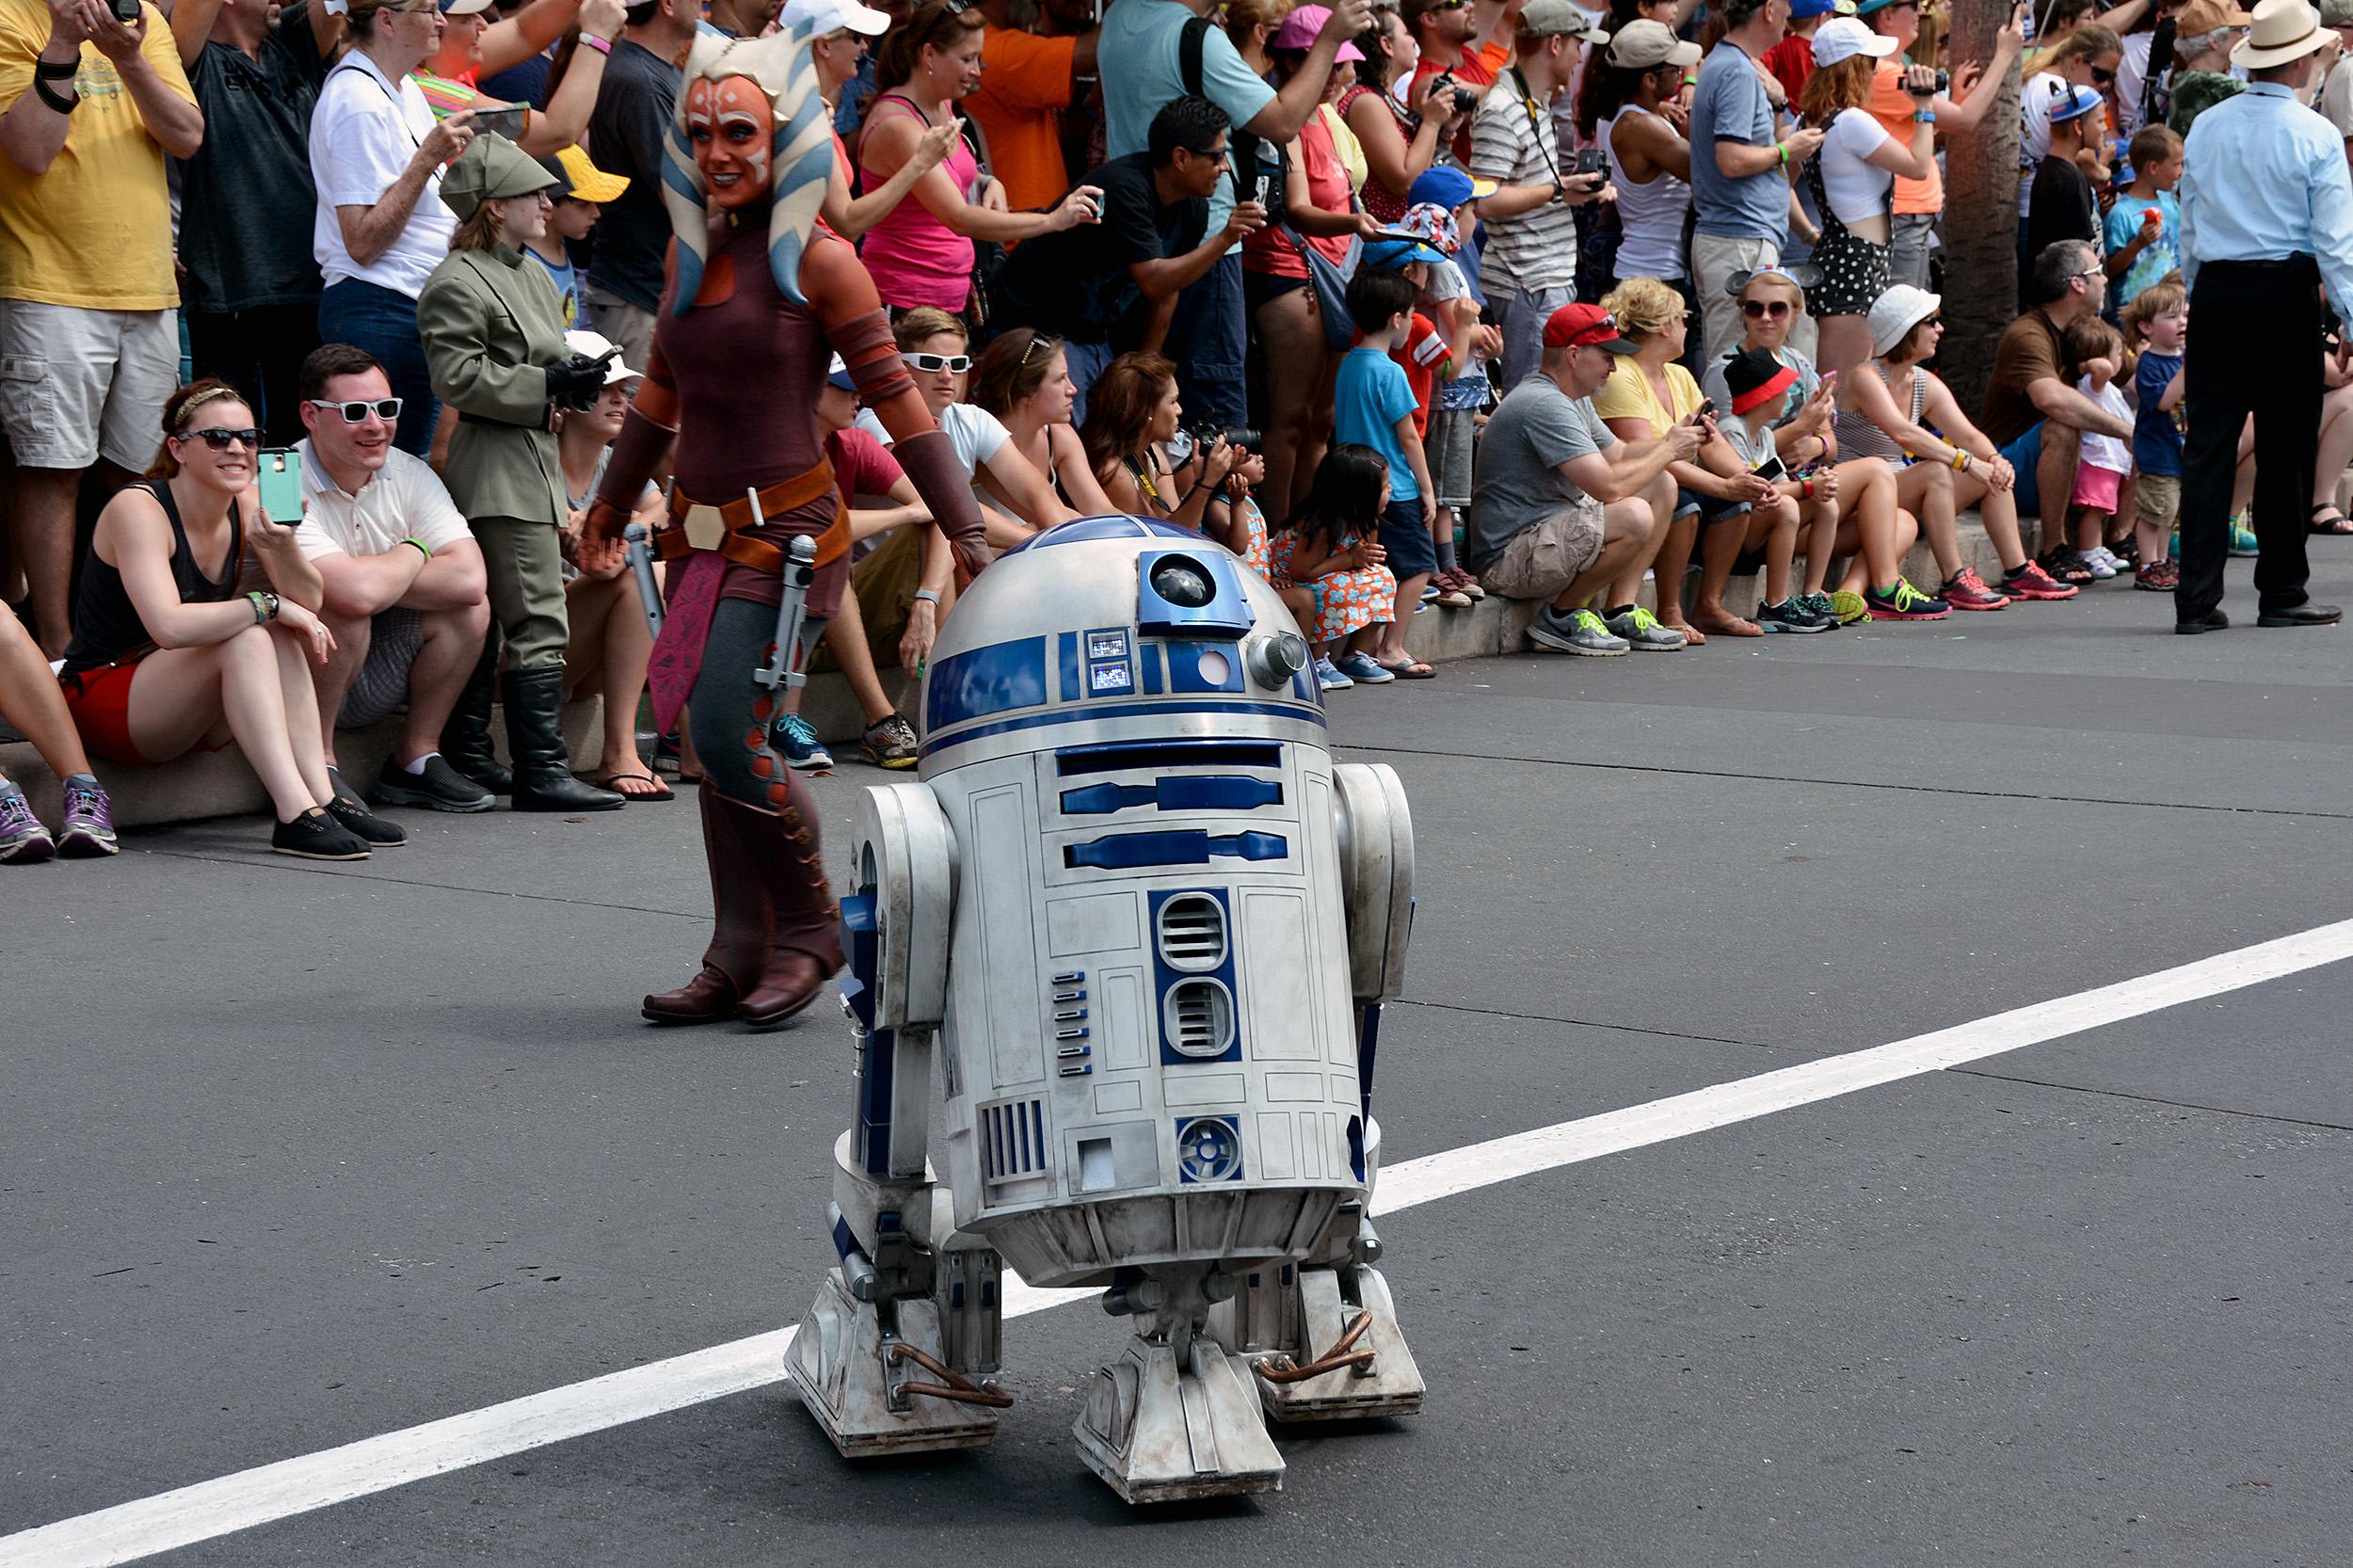 R2-D2 med Ahsoka Tano i bakgrunden.